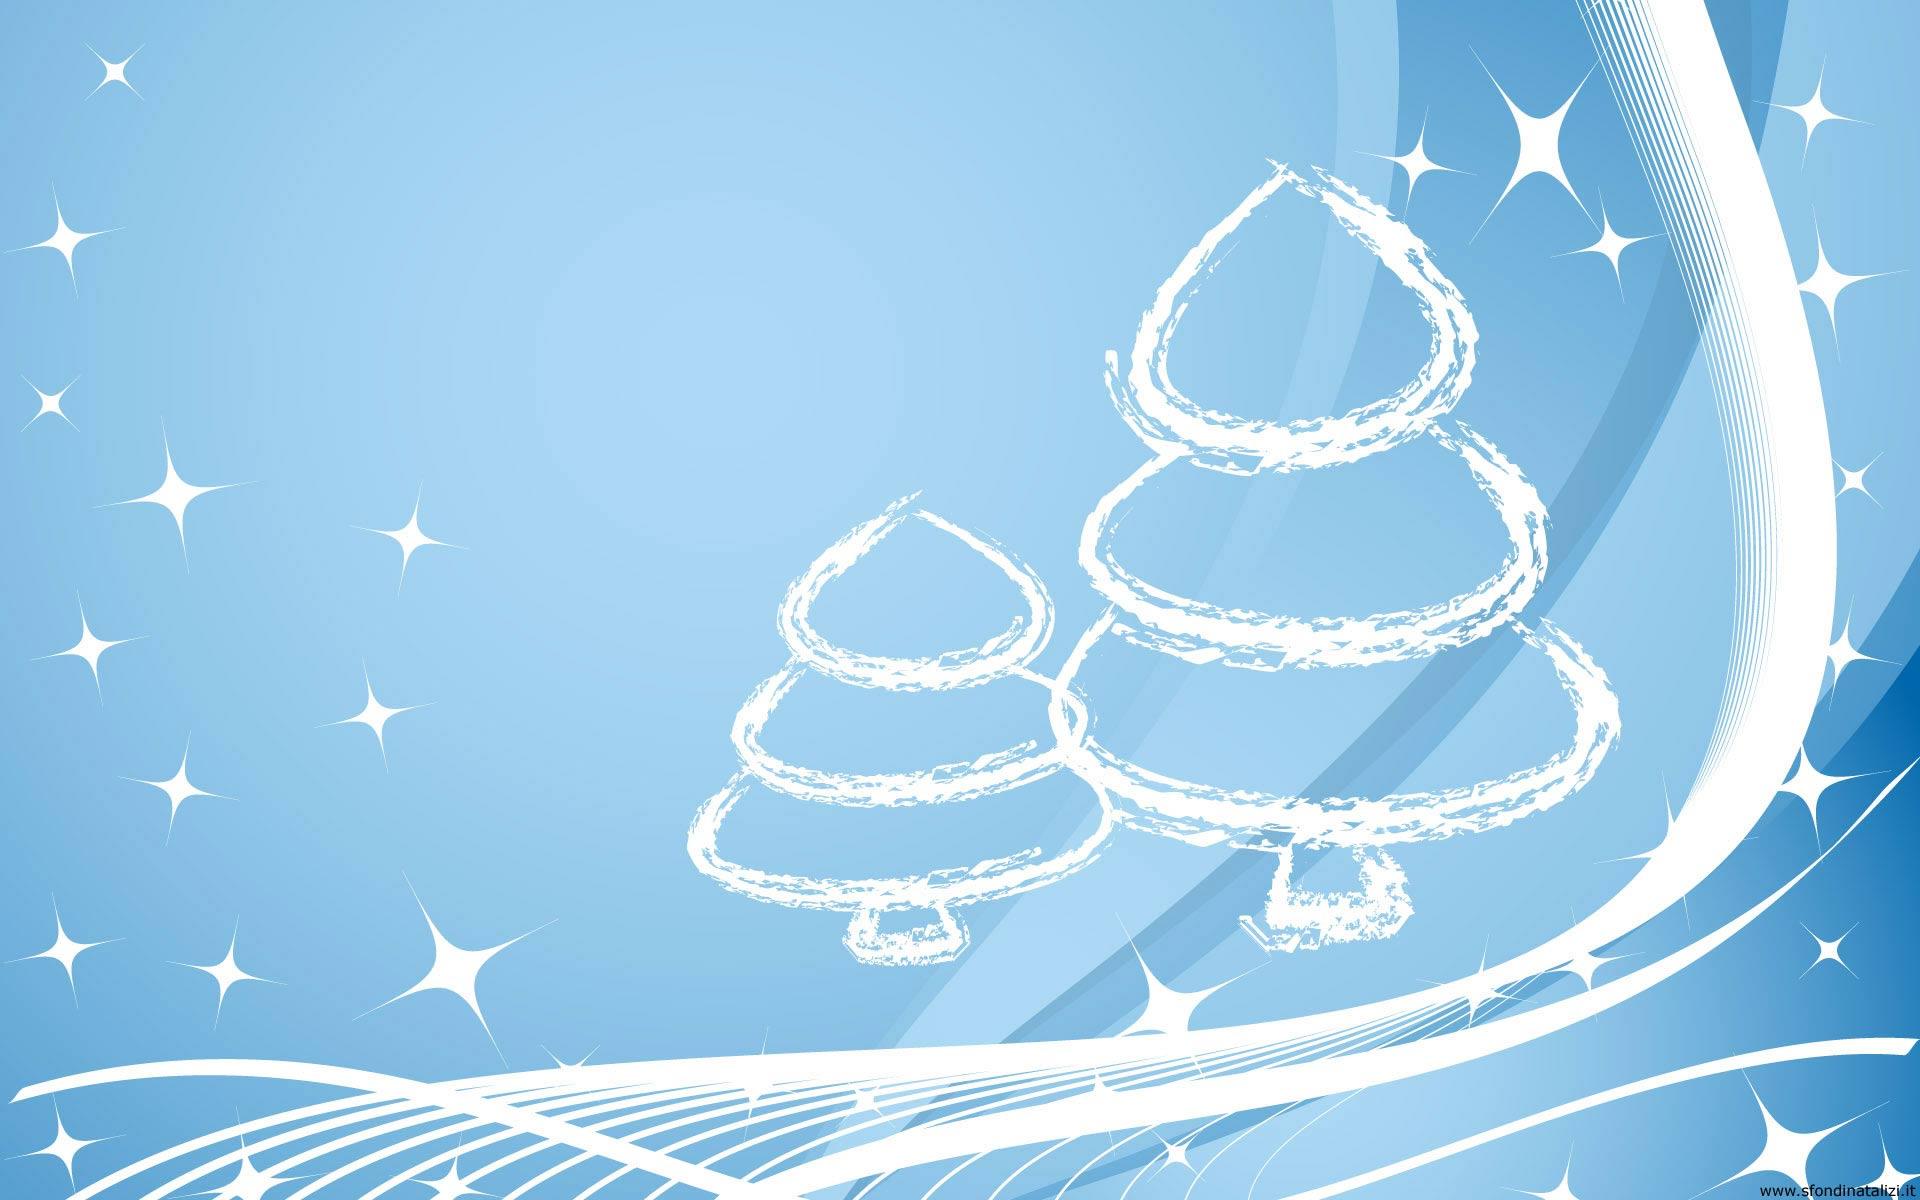 Immagini Natale Desktop.Sfondo Desktop Natale Alberi Di Natale